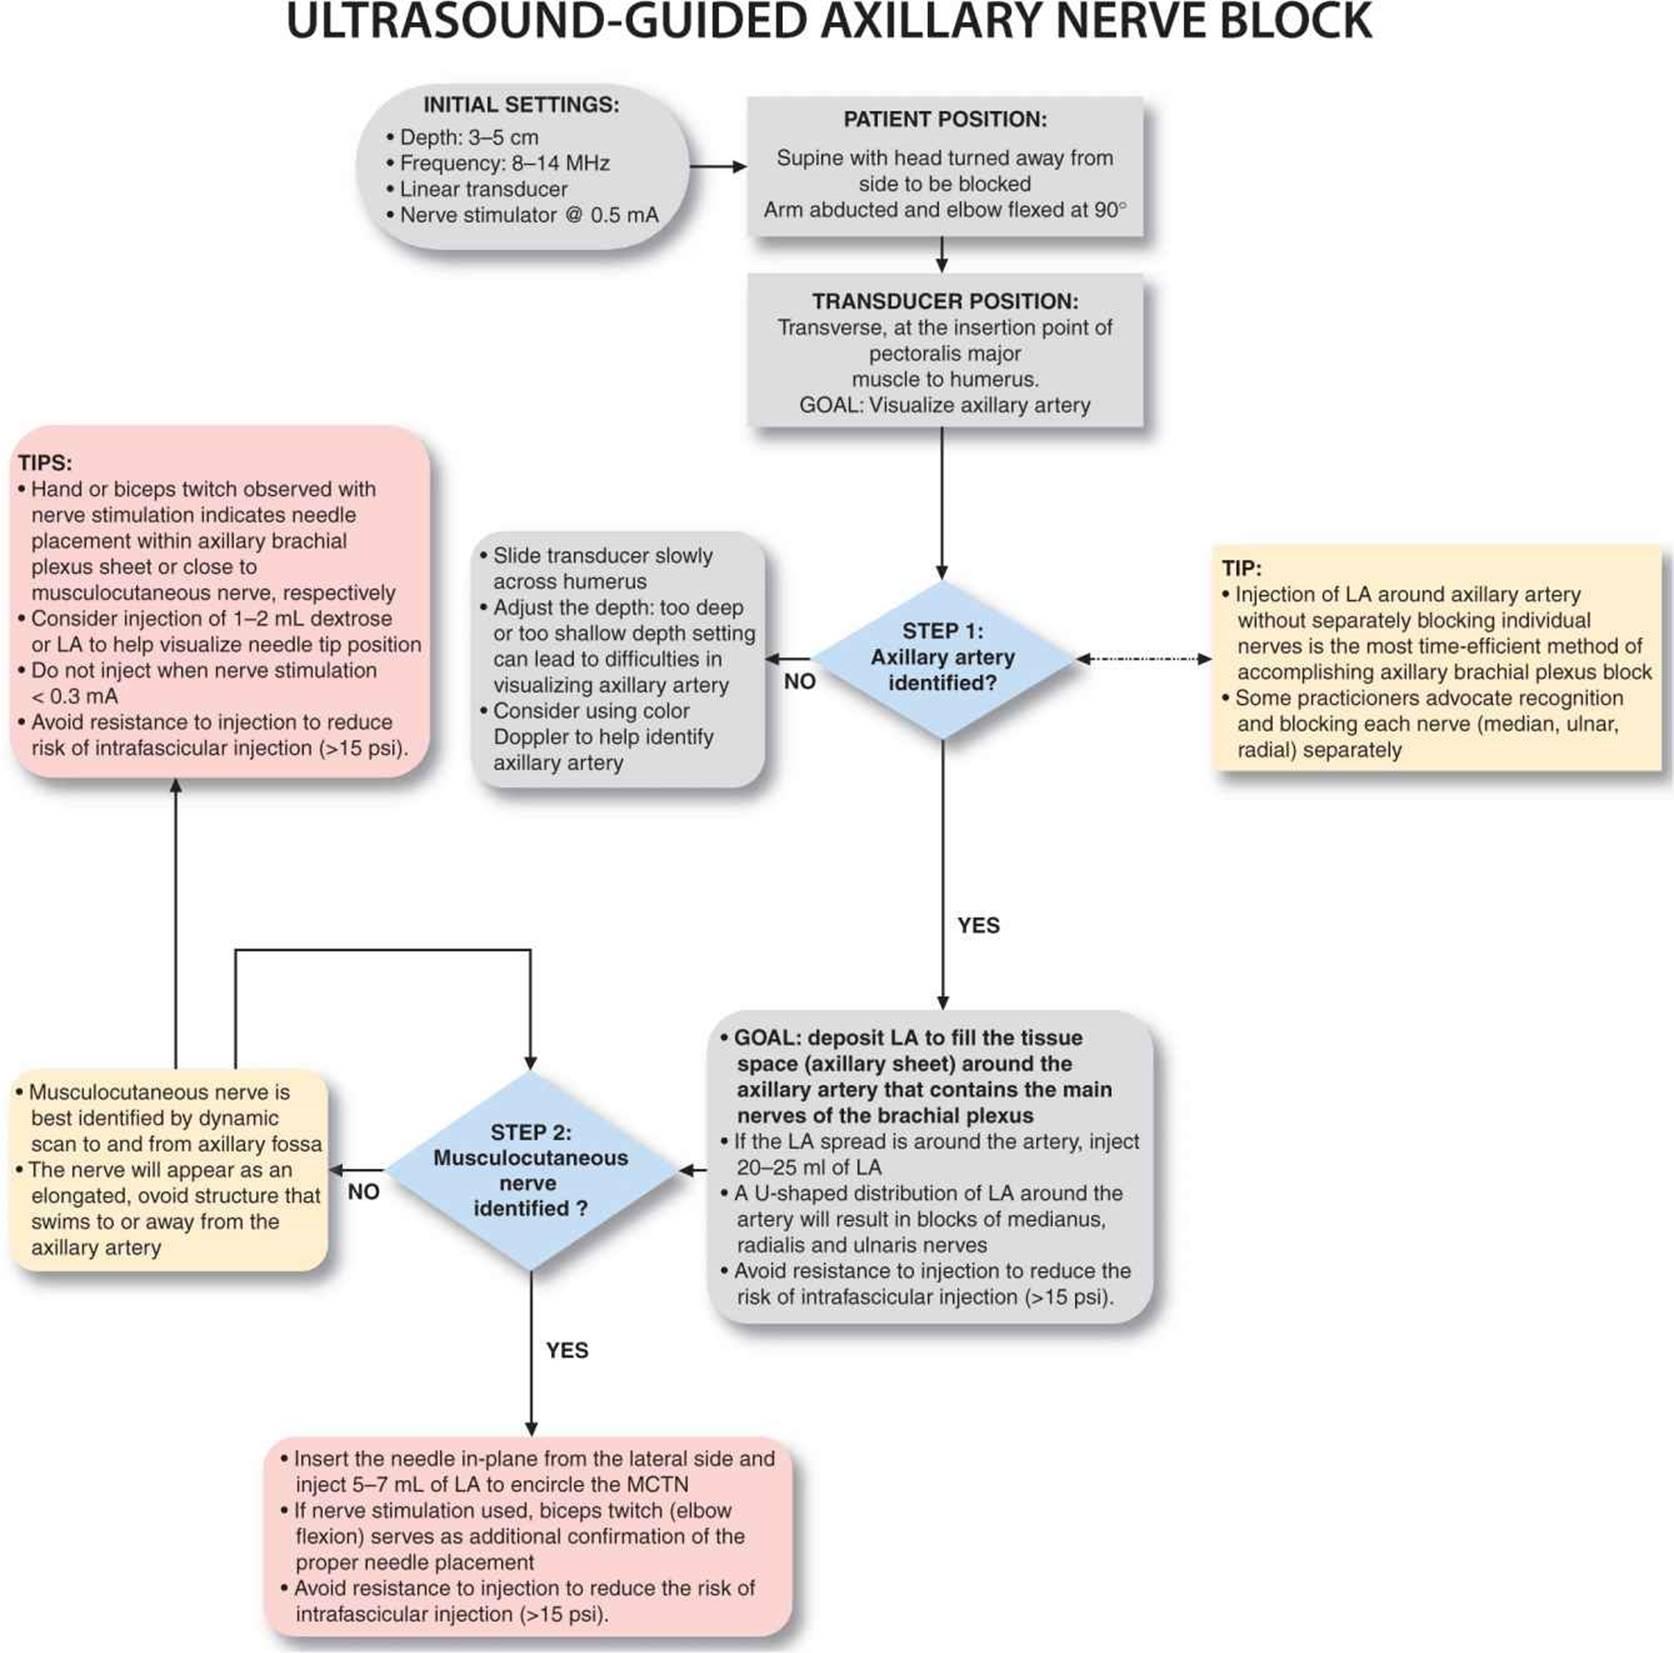 Ultrasound Guided Axillary Brachial Plexus Block Hadzics